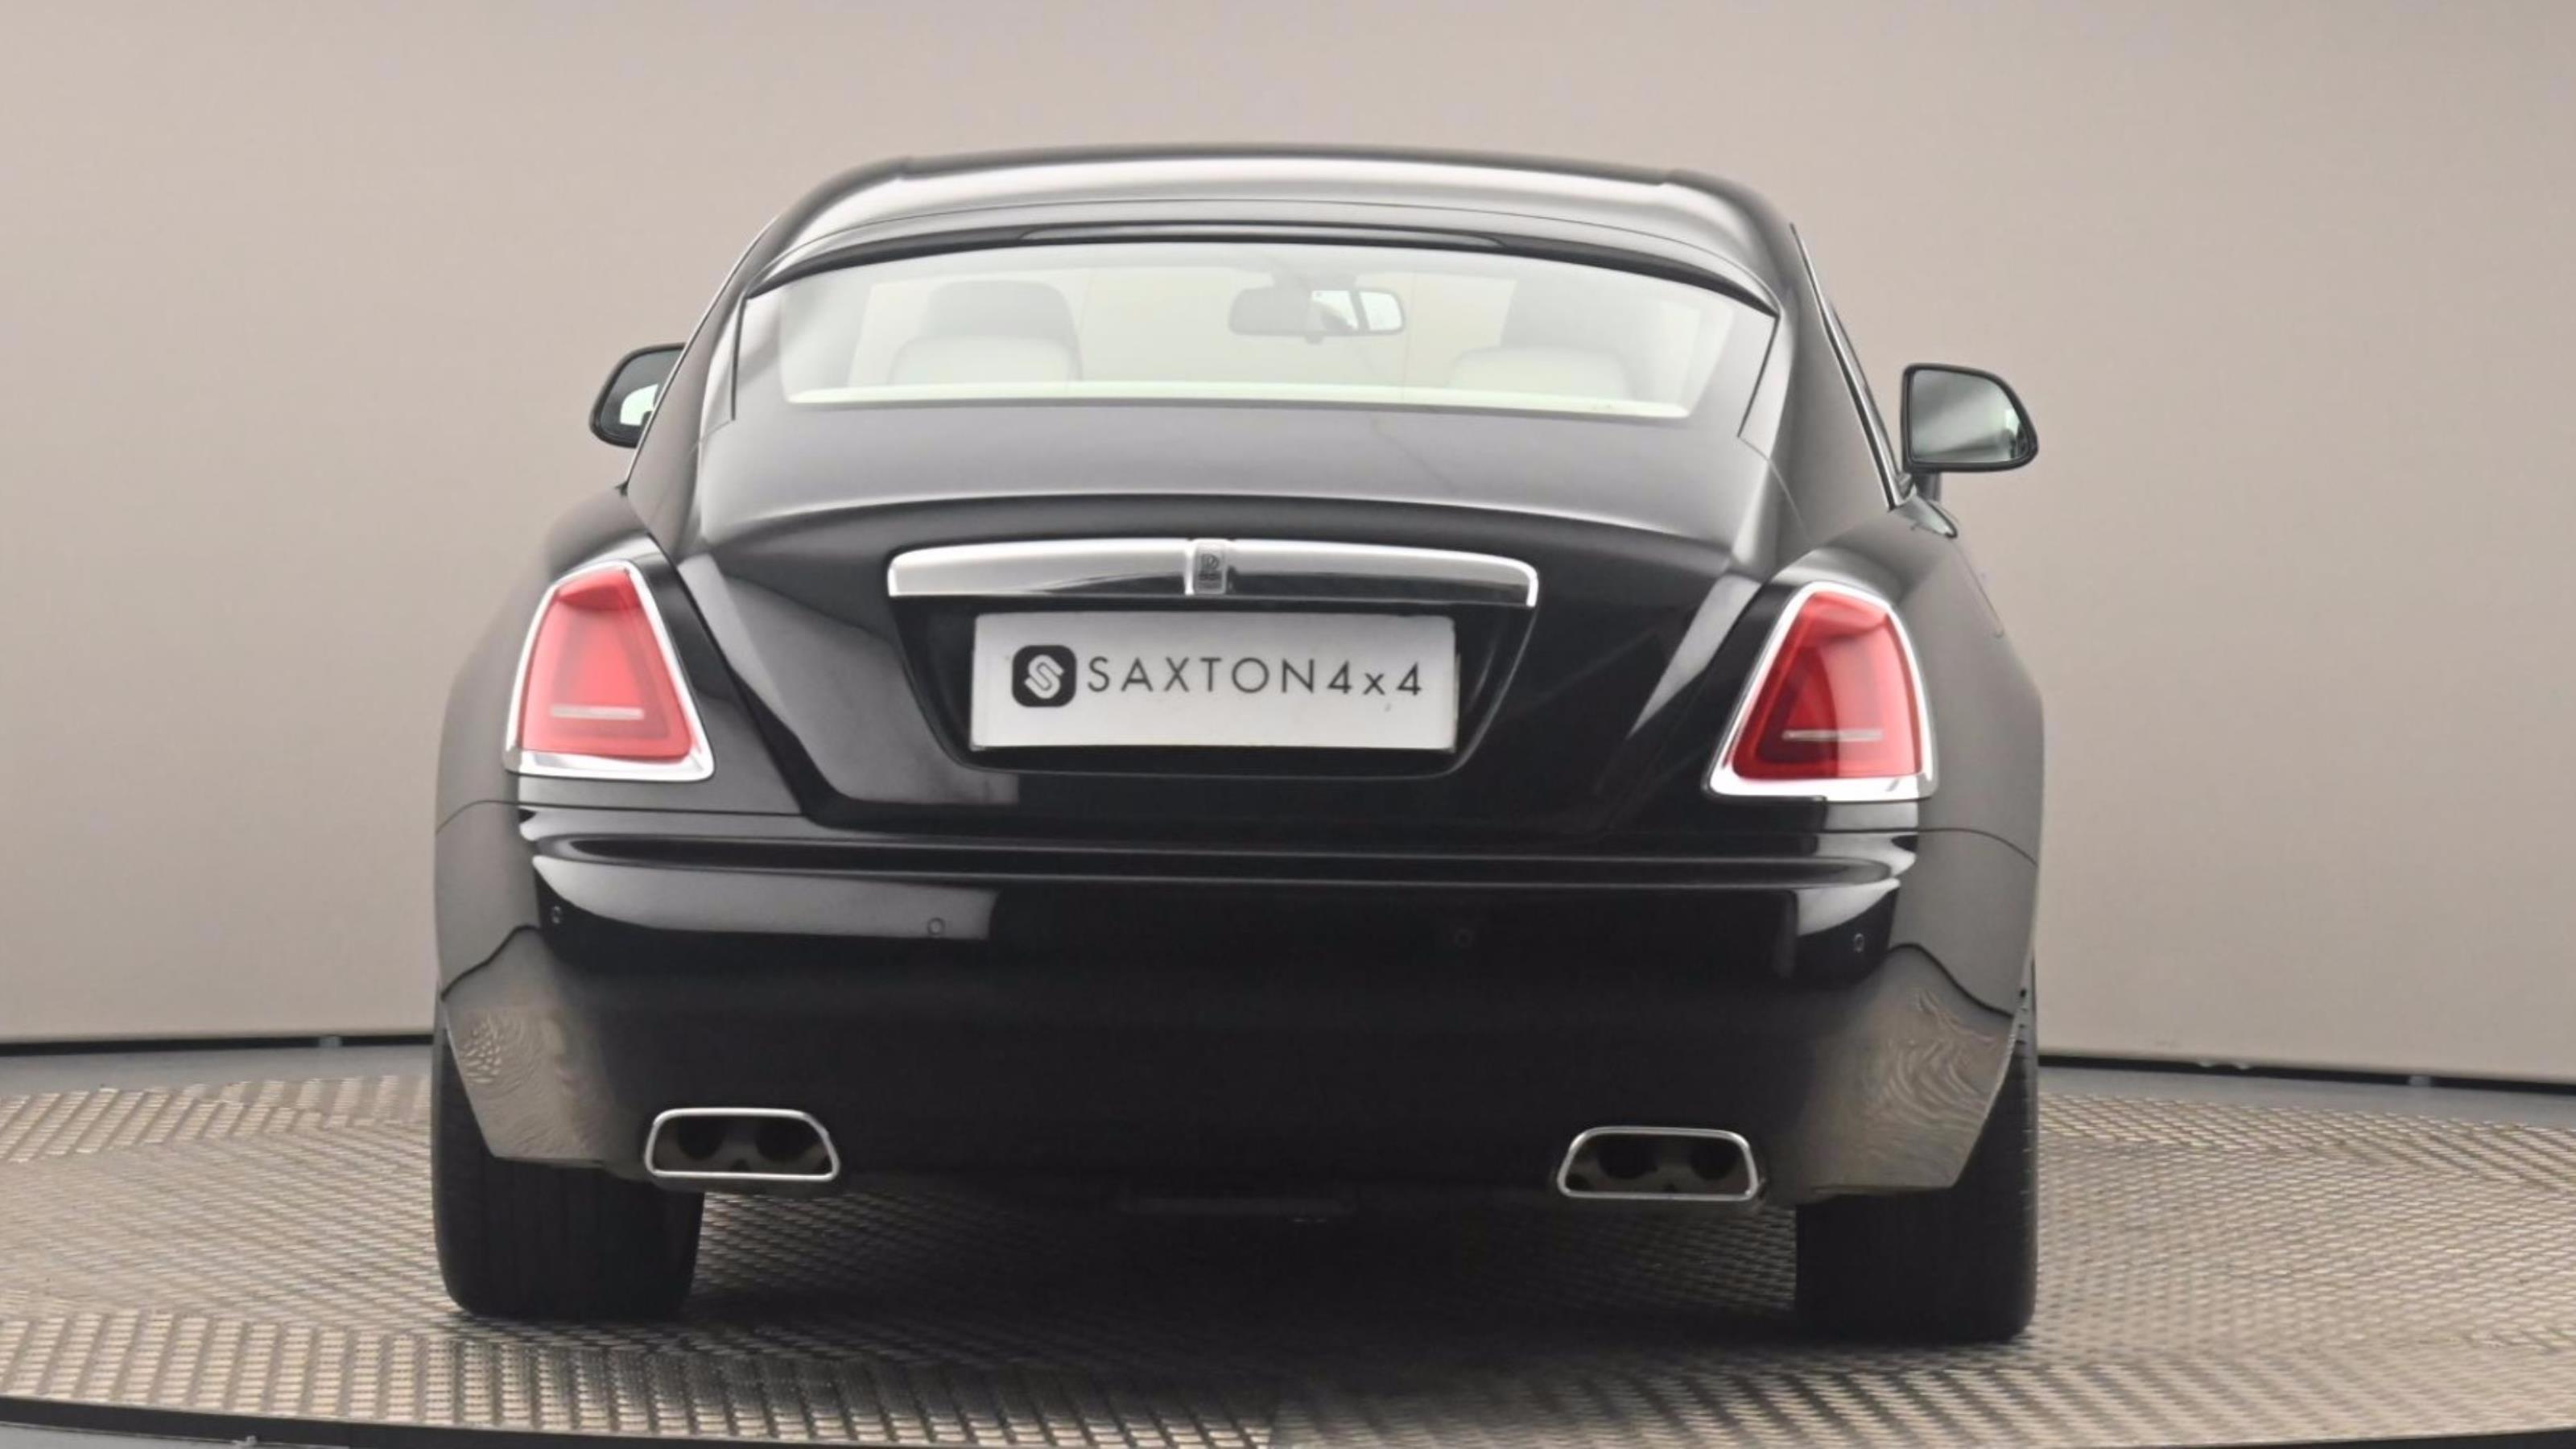 Used 2016 Rolls-Royce WRAITH 2dr Auto BLACK at Saxton4x4